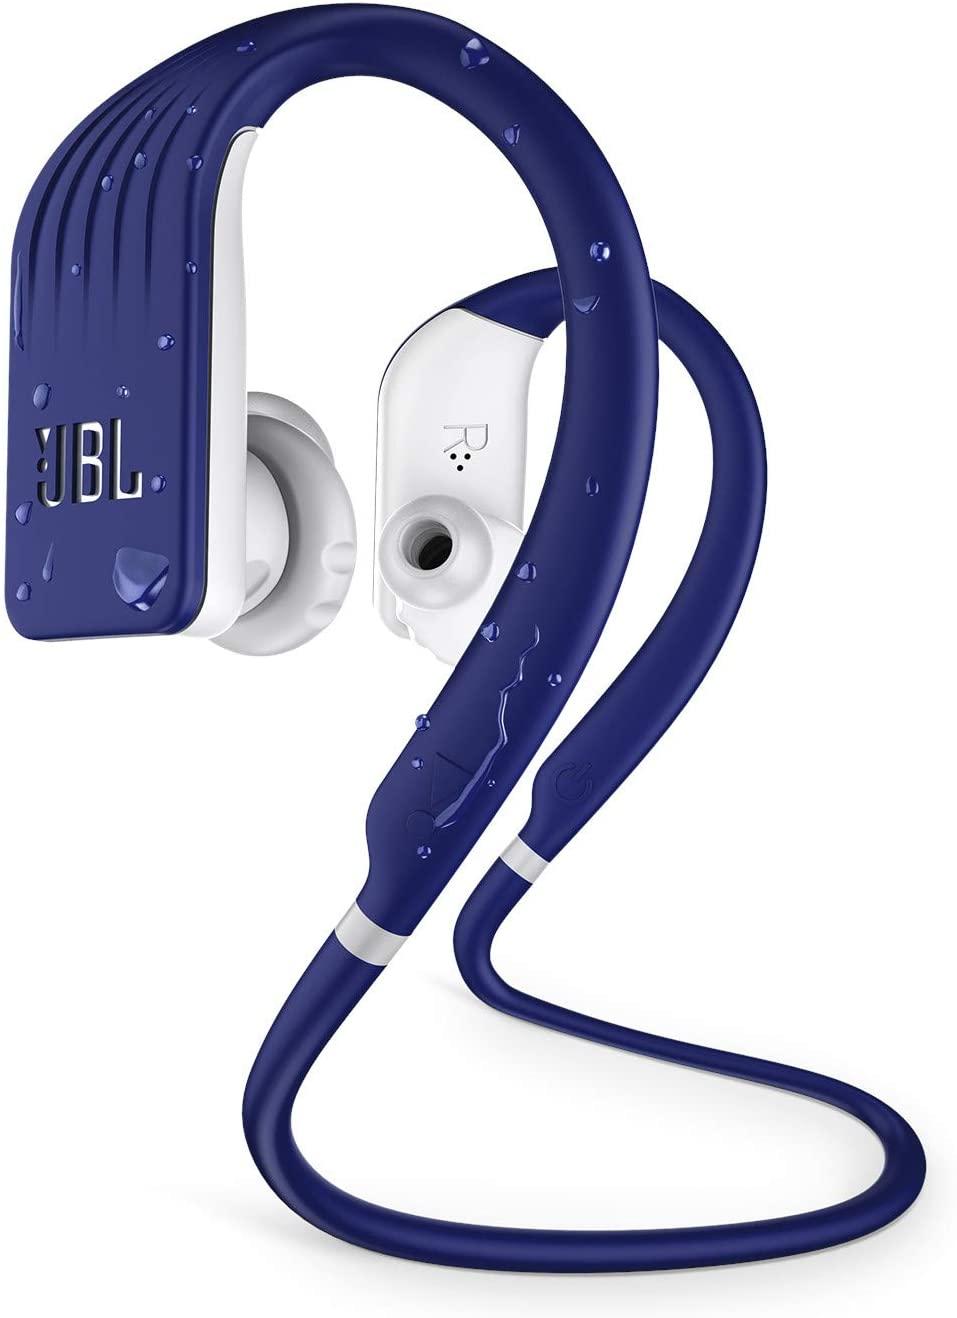 JBL Endurance JUMP  Waterproof Wireless In-Ear Headphones (Blue)